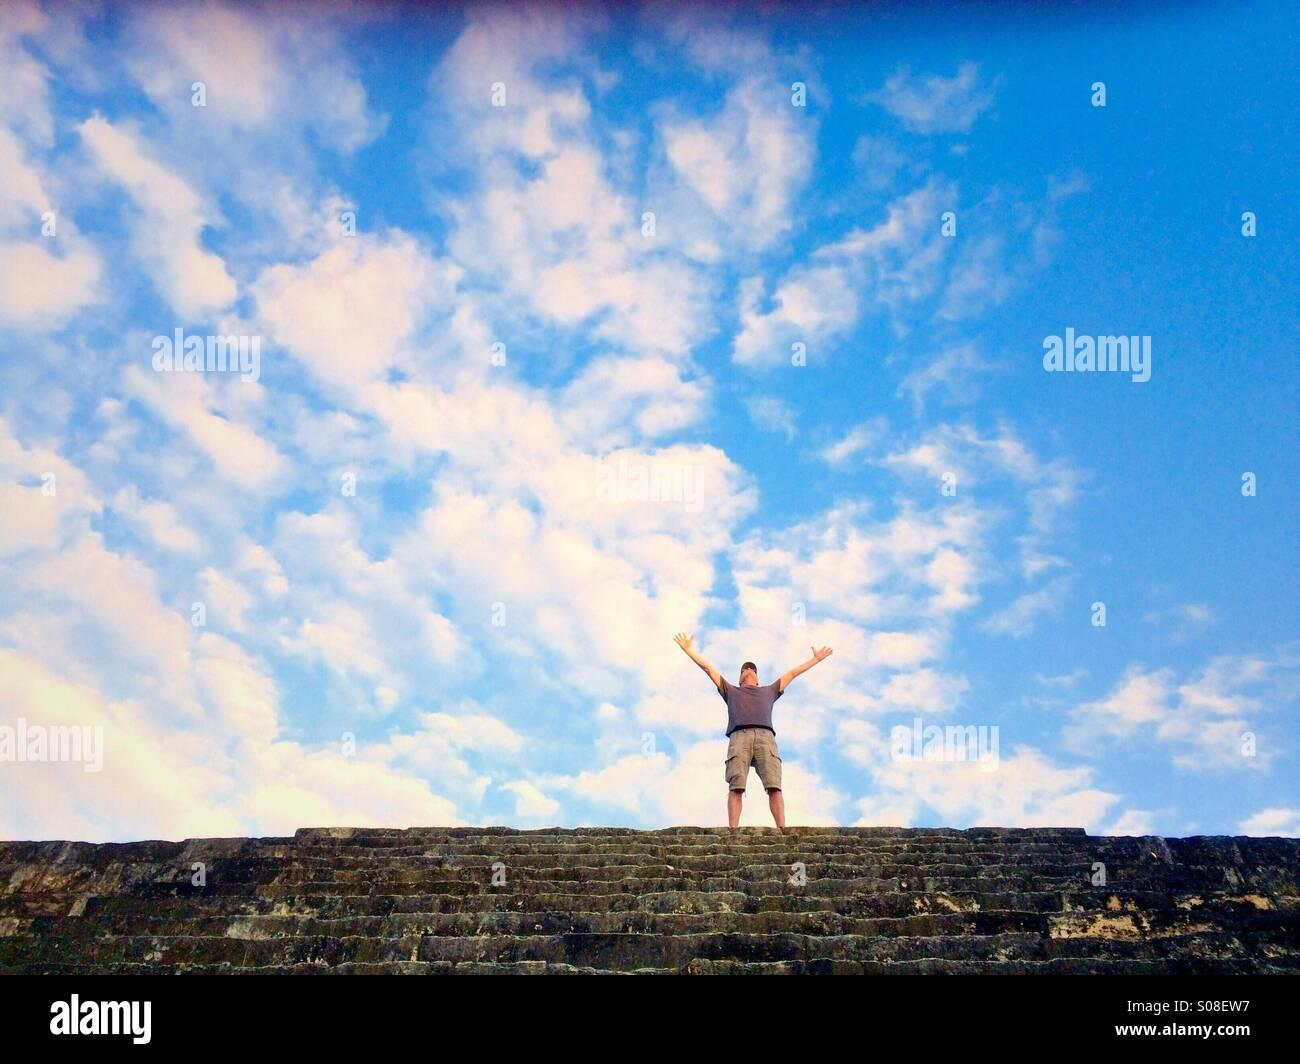 Una en la parte superior de la pirámide maya, Tikal, Guatemala Foto de stock